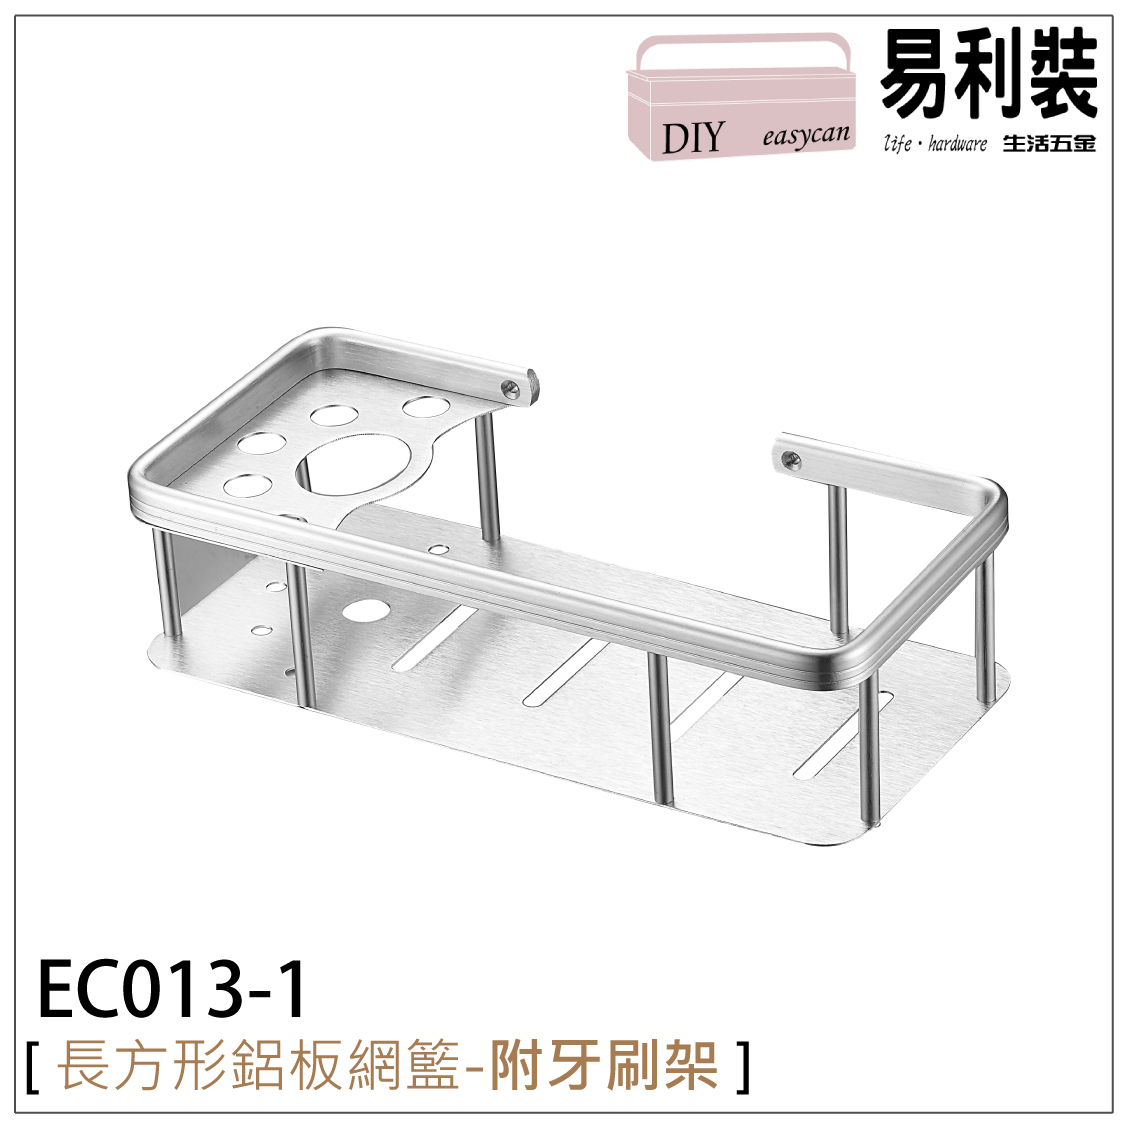 【 EASYCAN  】EC013-1 長方形鋁板網籃附牙刷架 易利裝生活五金 鋁合金 置物架 收納架 廚房 餐廳 房間 浴室 小資族